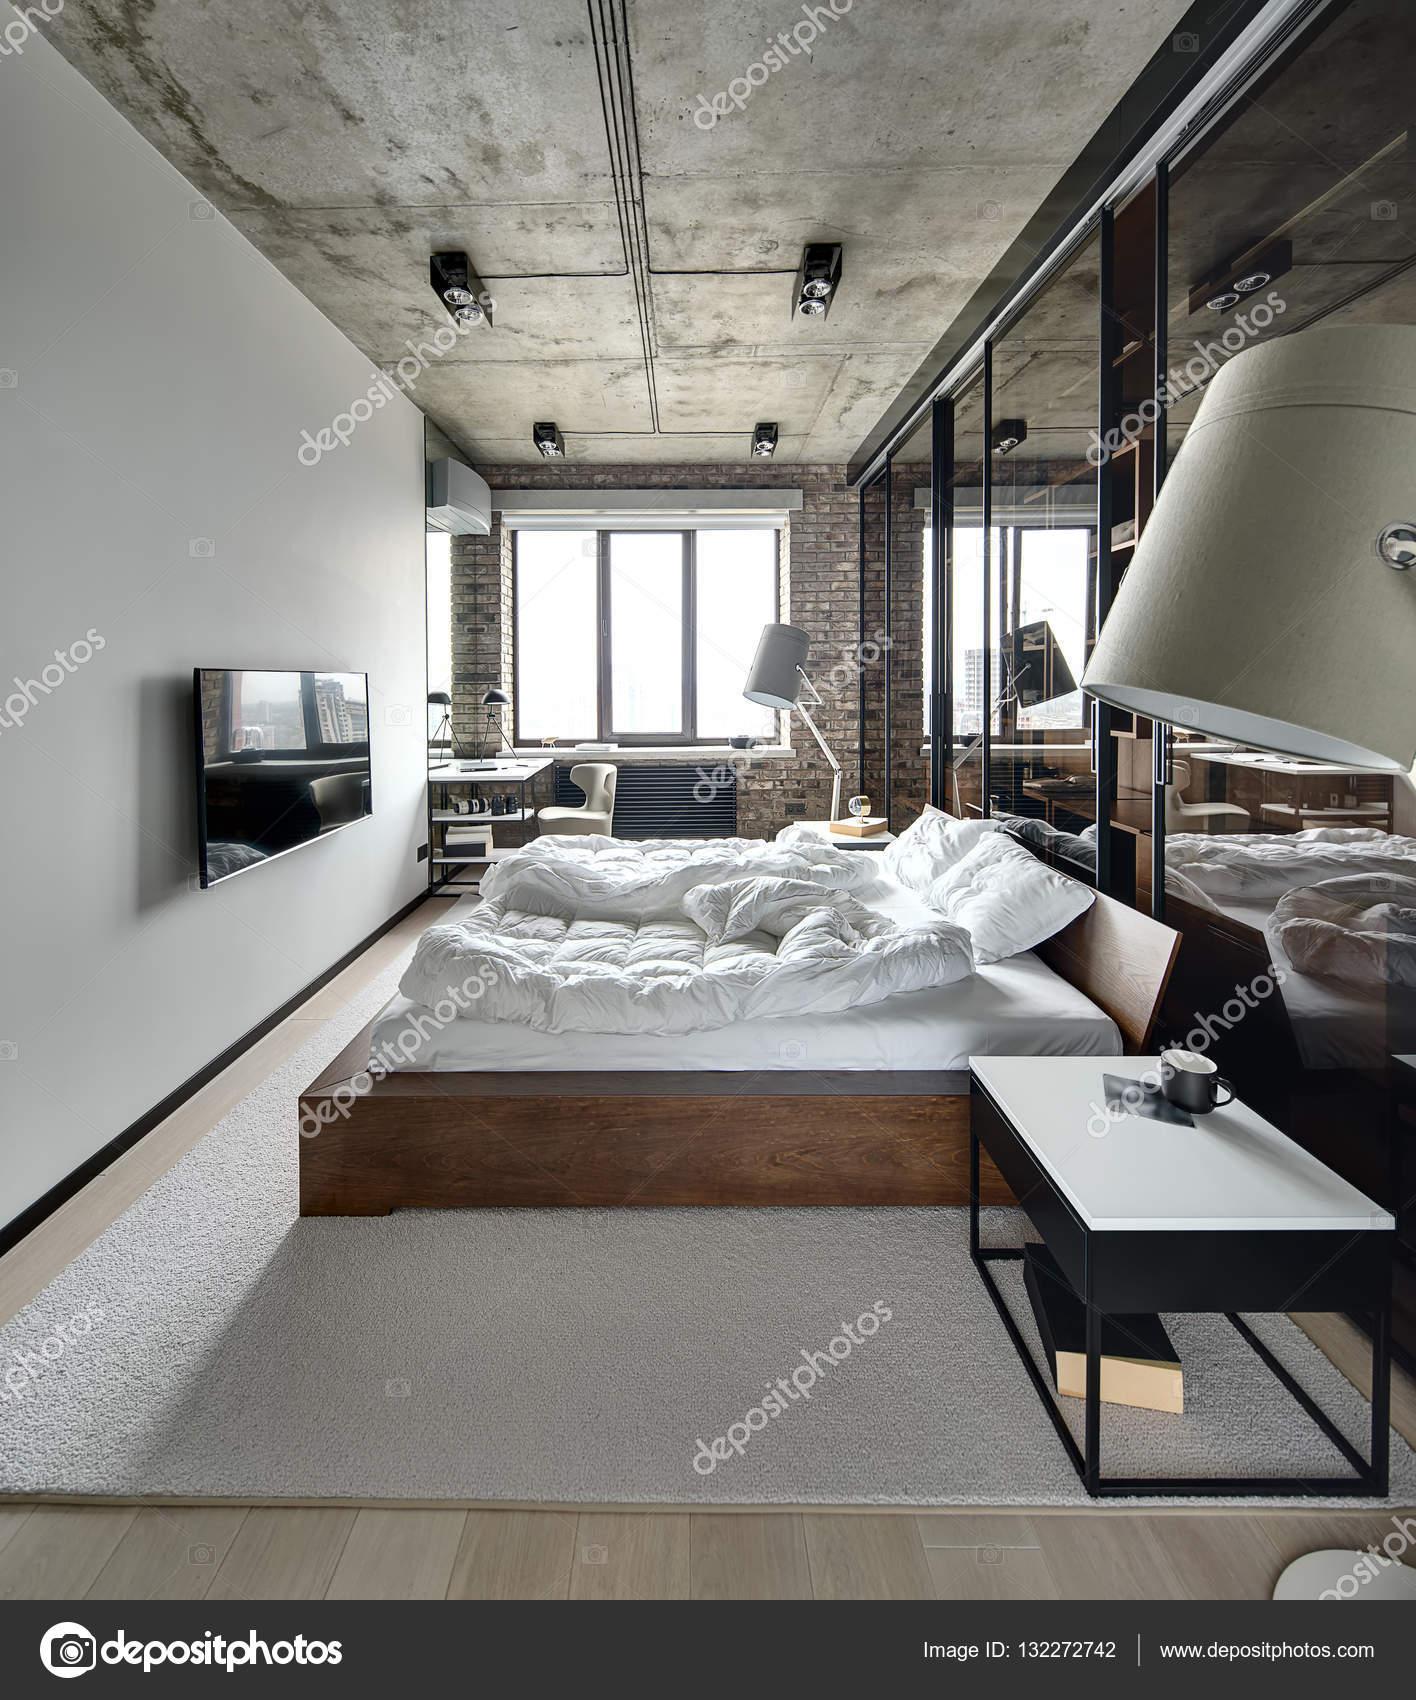 Loft stijl slaapkamer — Stockfoto © bezikus #132272742